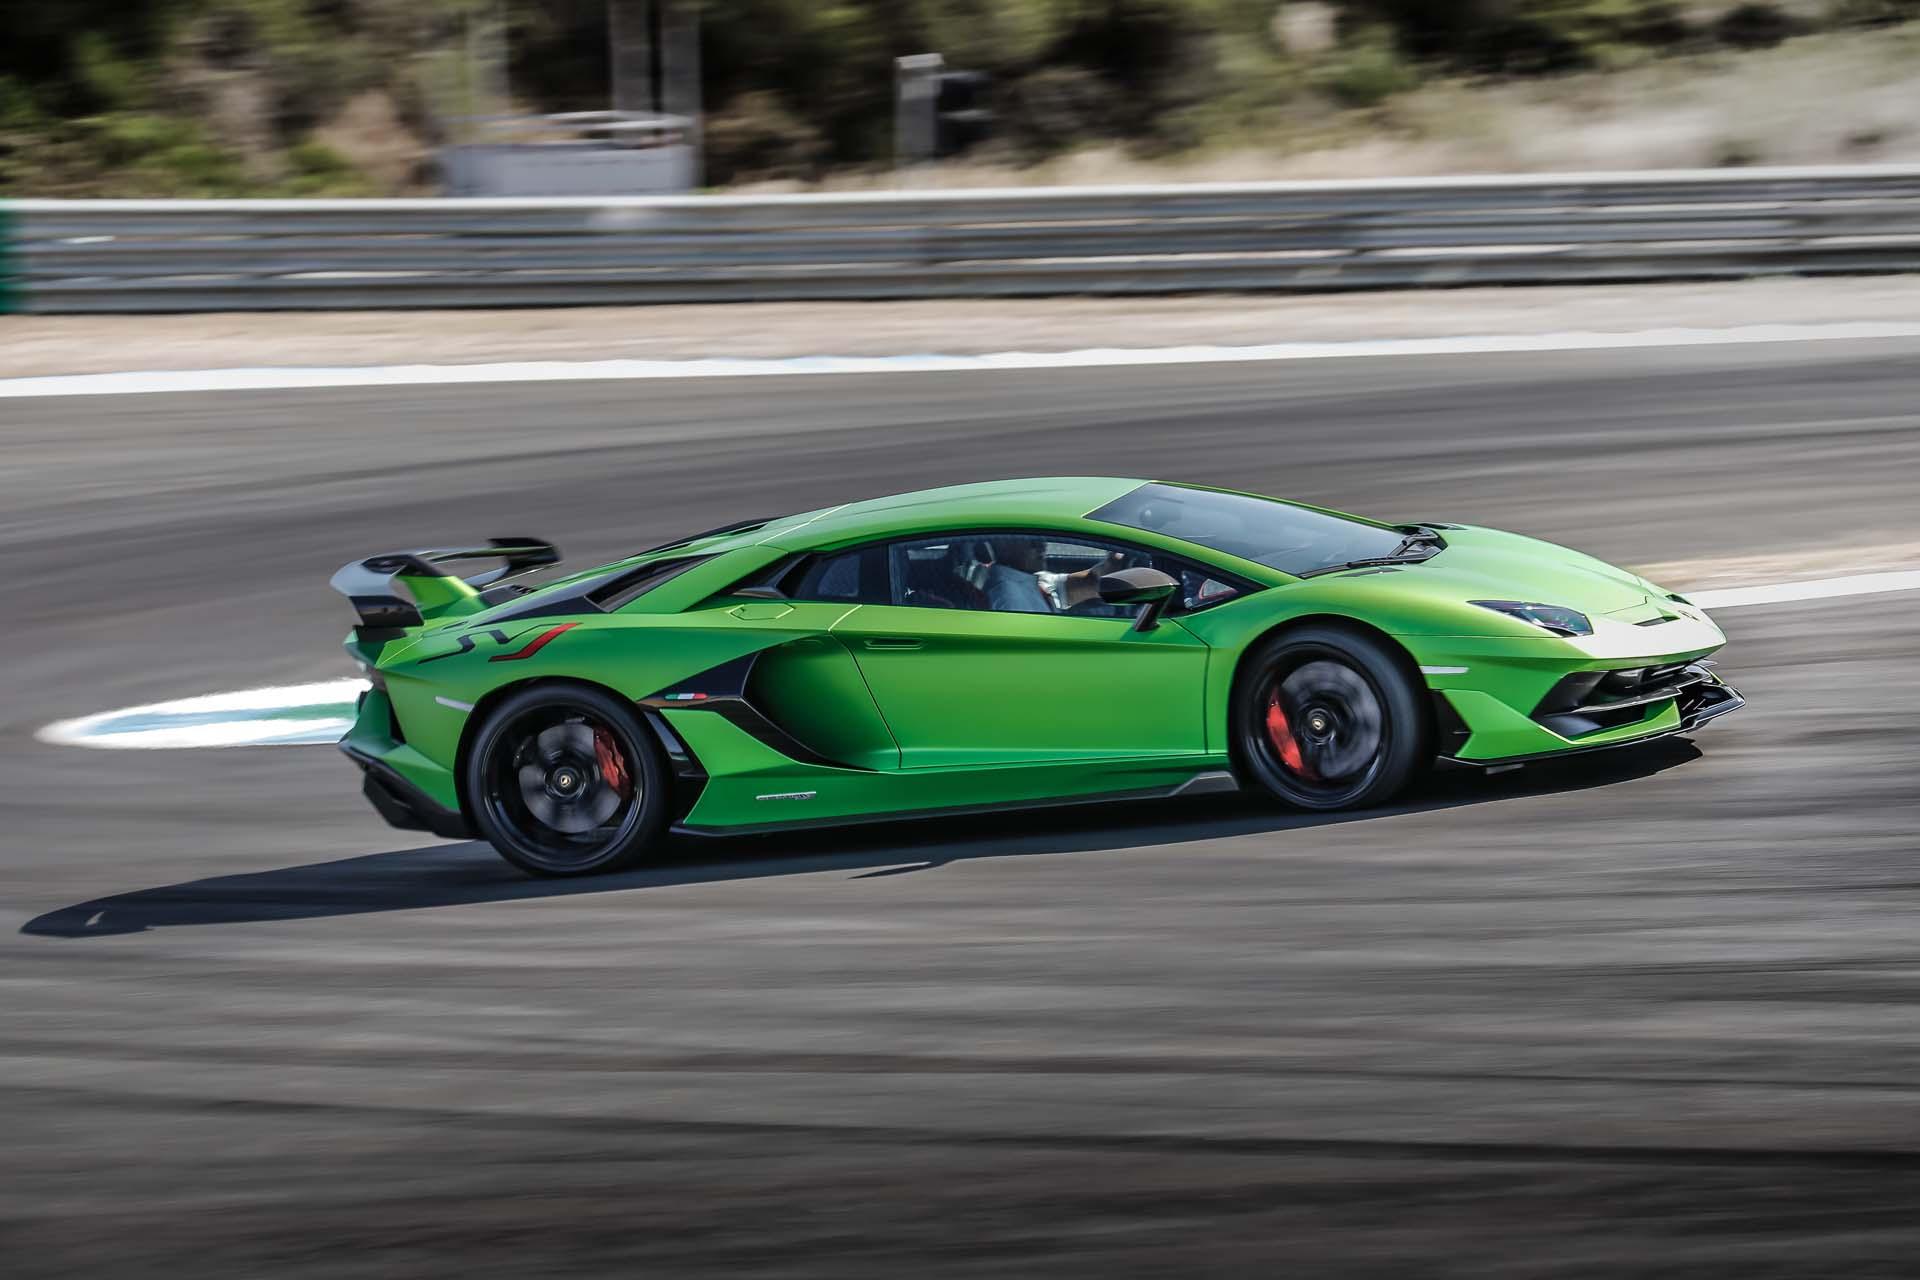 2019 Lamborghini Aventador SVJ Side Wallpapers #17 of 241